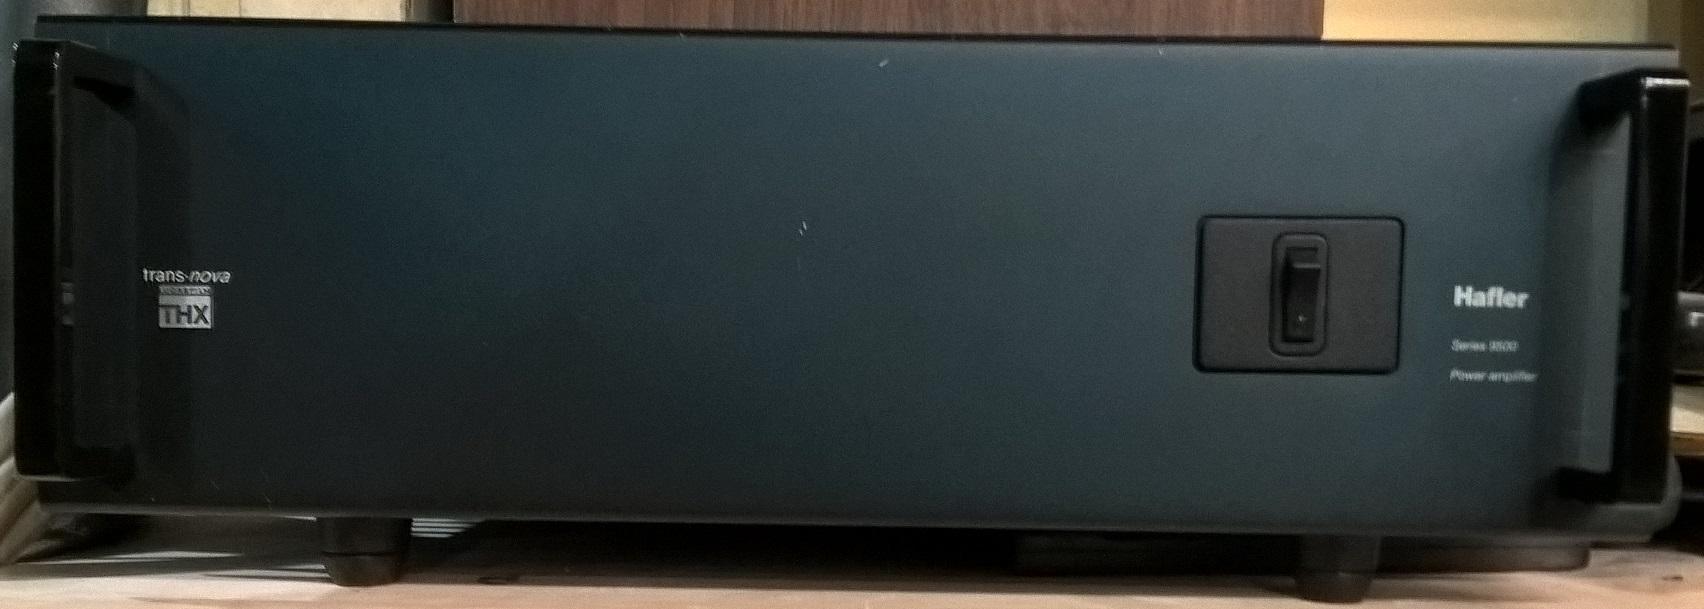 Hafler 9500 Front.jpg